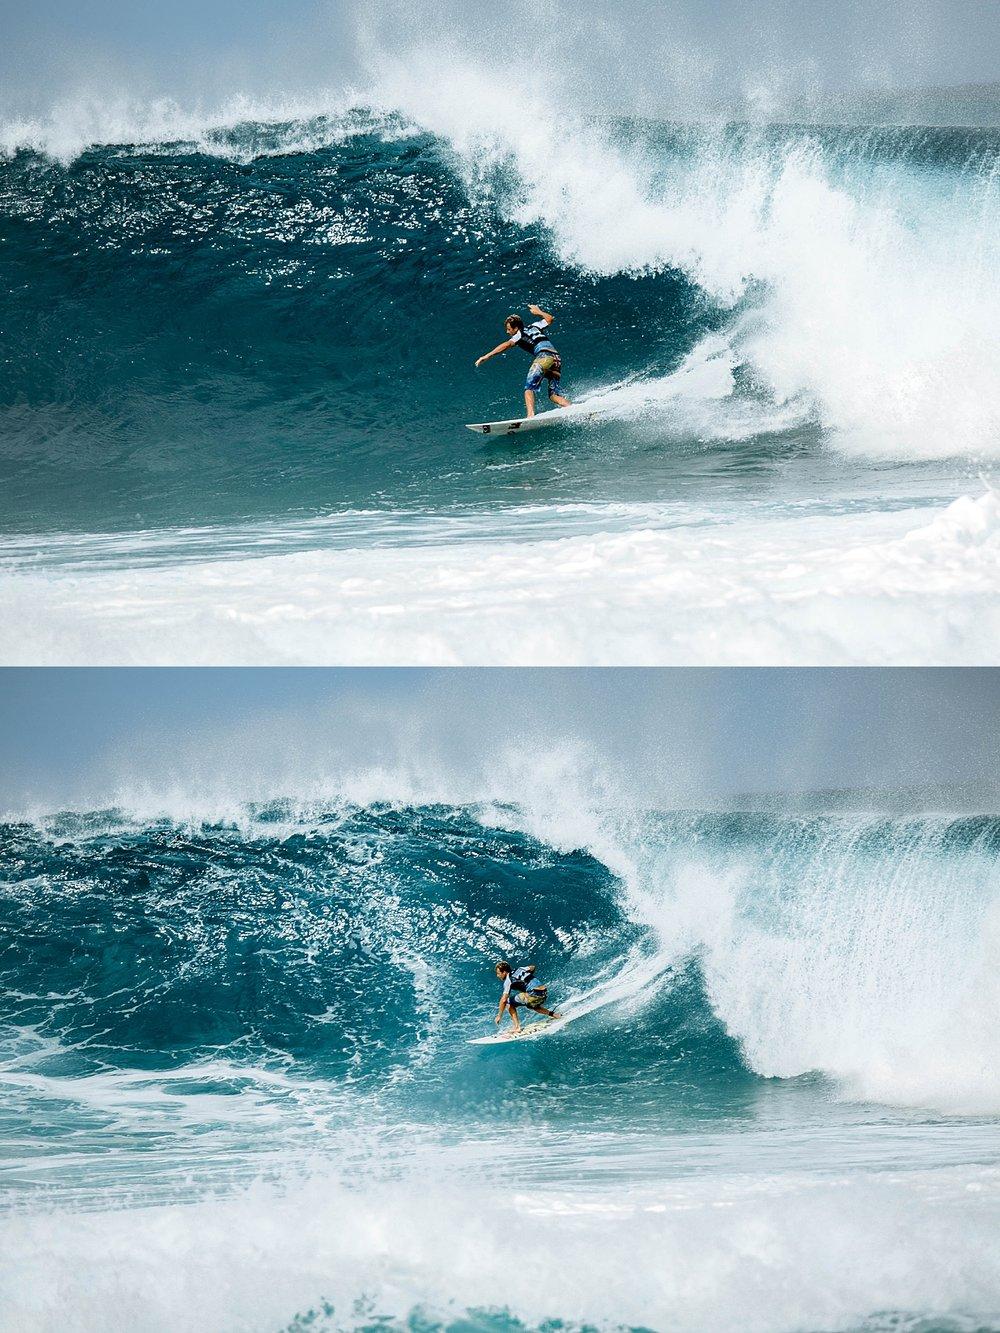 Travel Surf and Travel Lifestyle Photographer Kelee Bovelle @keleeb - Billabong Pipe Masters 2018 North Shore Oahu Hawaii_0011.jpg